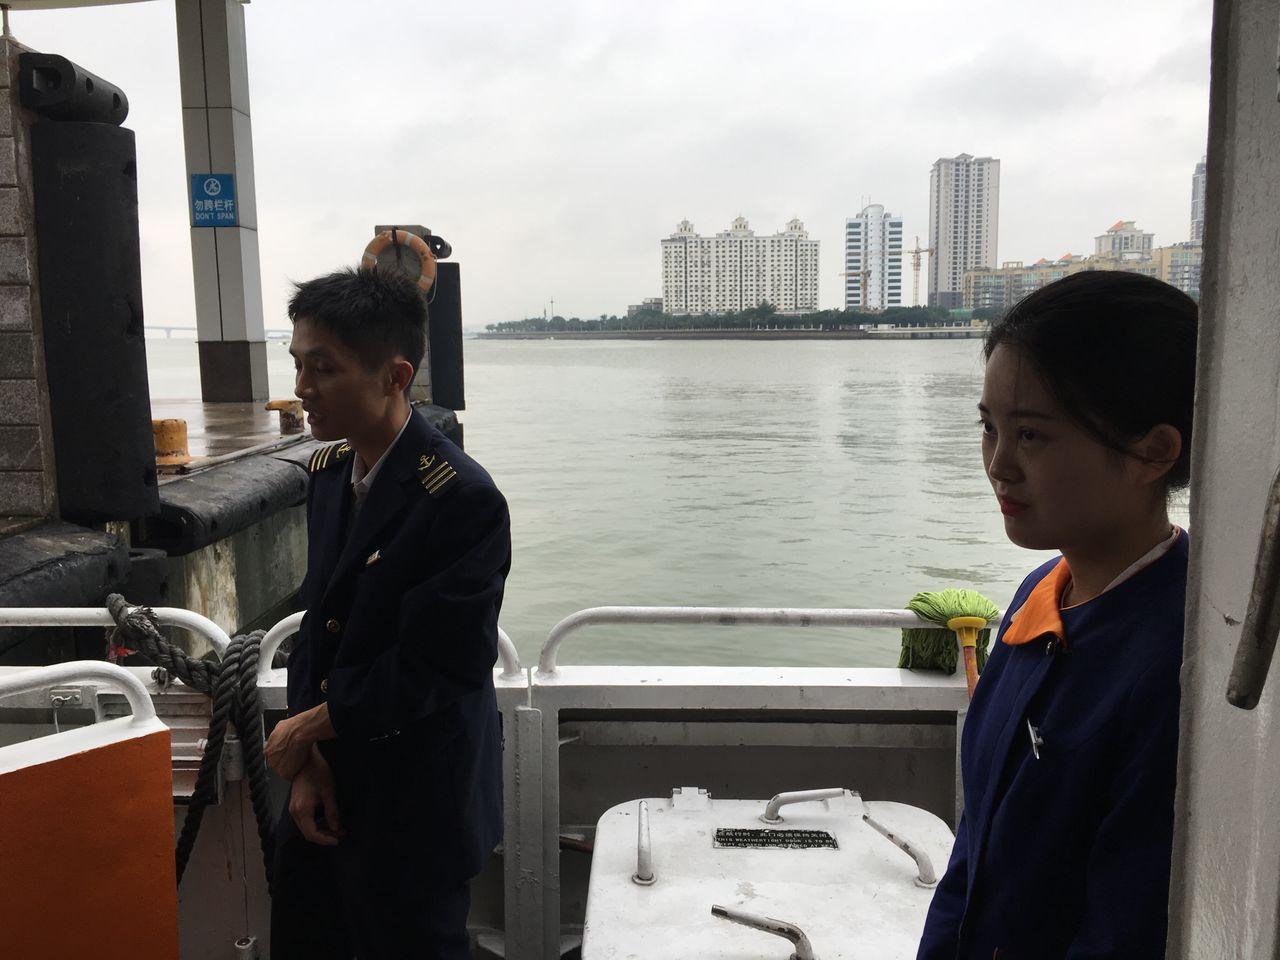 Welcome to ferryboat. Ferryboat Ferry Boat EyeEm Best Shots EyeEm Gallery Eyeem Market EyeEm China Zhuhai China Photos Beauty Of China The City Light